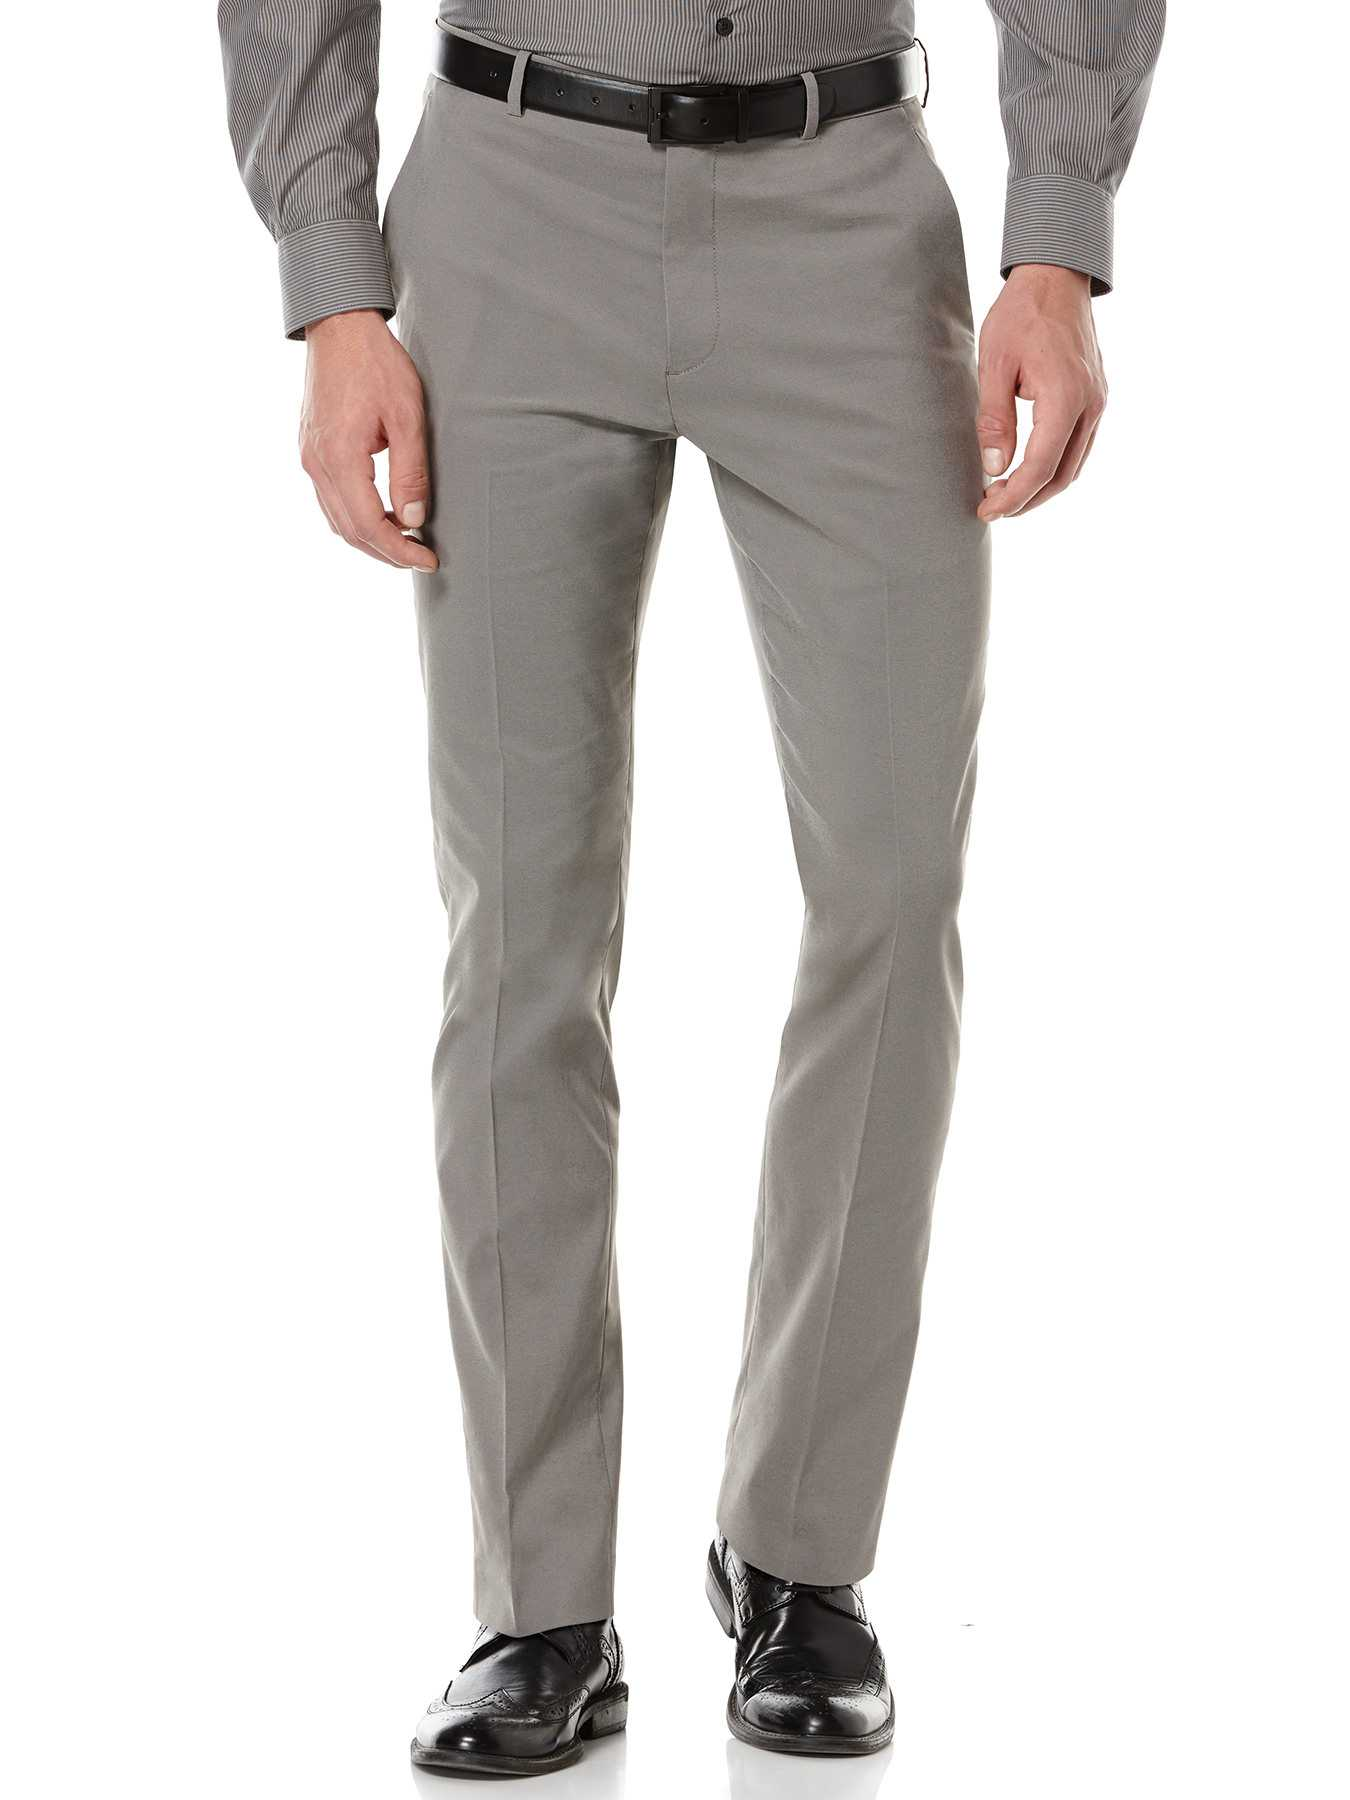 Perry Ellis Very Slim Iridescent Twill Suit Pant